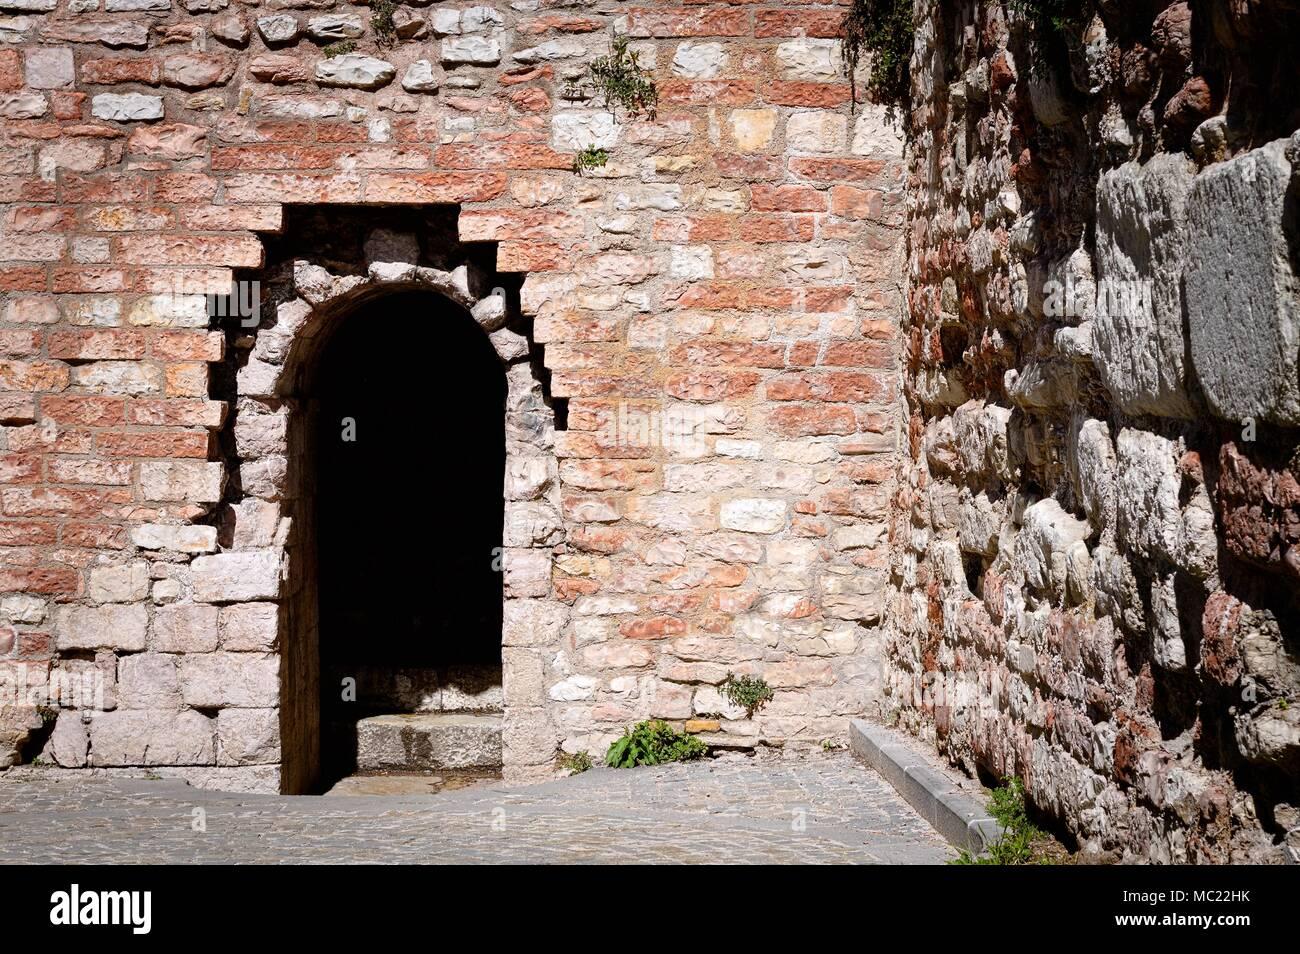 entrance of a castle round arch and brick walls spello umbria